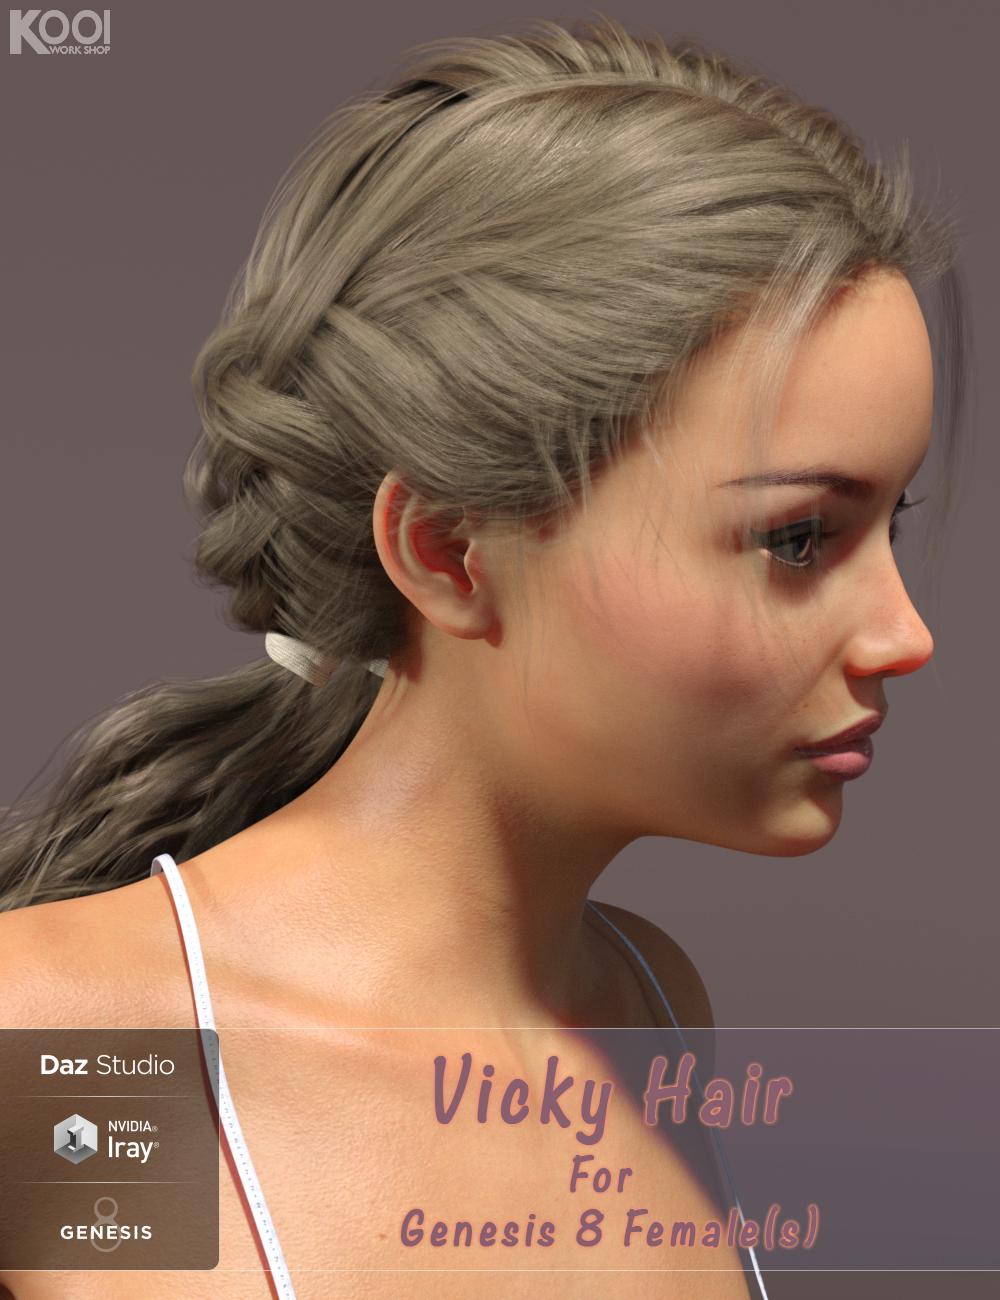 Vicky Hair for Genesis 8 Female(s) by: Kool, 3D Models by Daz 3D